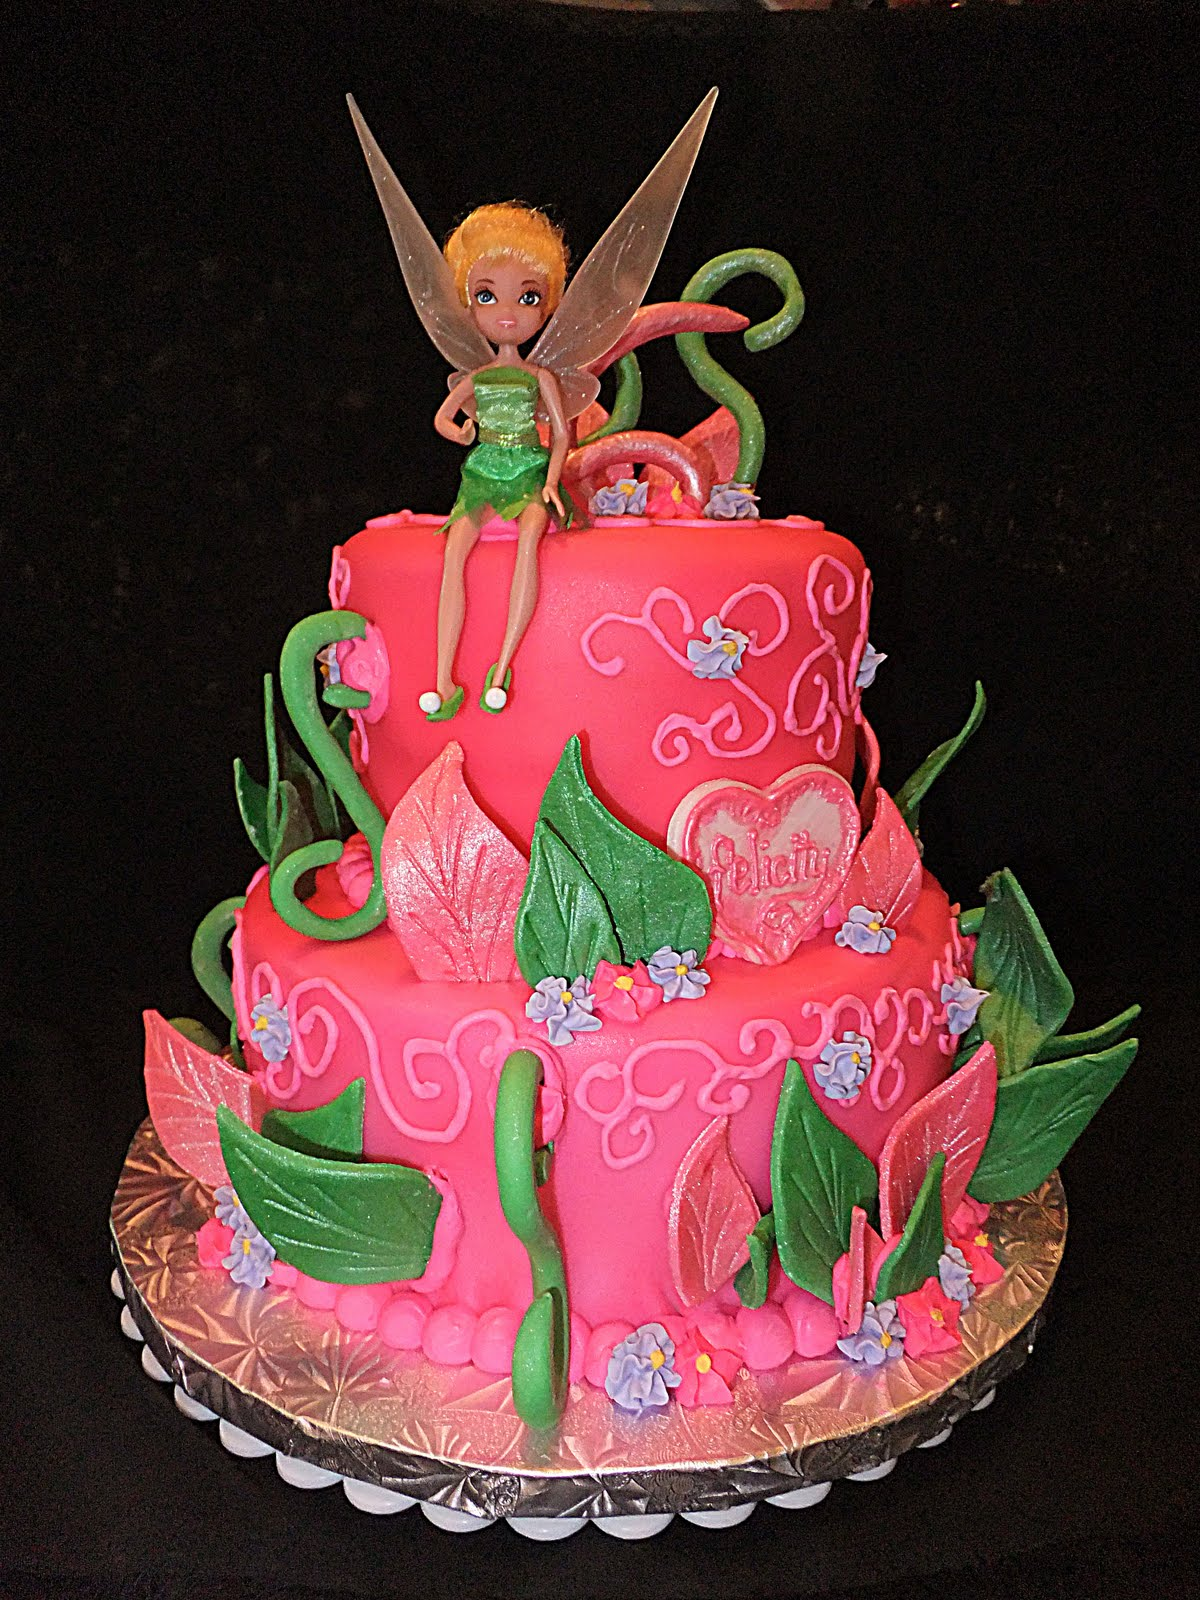 Tinkerbell Cake Images Photos : padicakes: 2/1/11 - 3/1/11